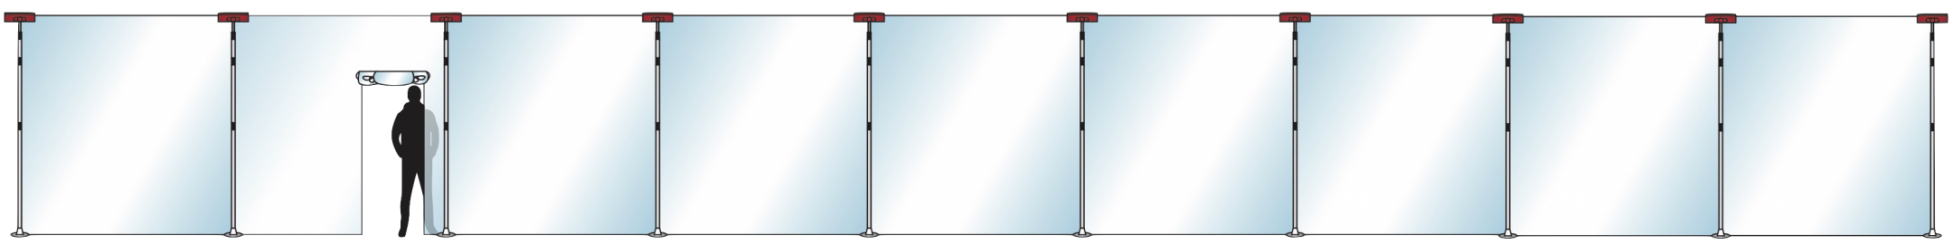 Stofscherm ZipScreen 10 set, variabele breedte tot 23 m